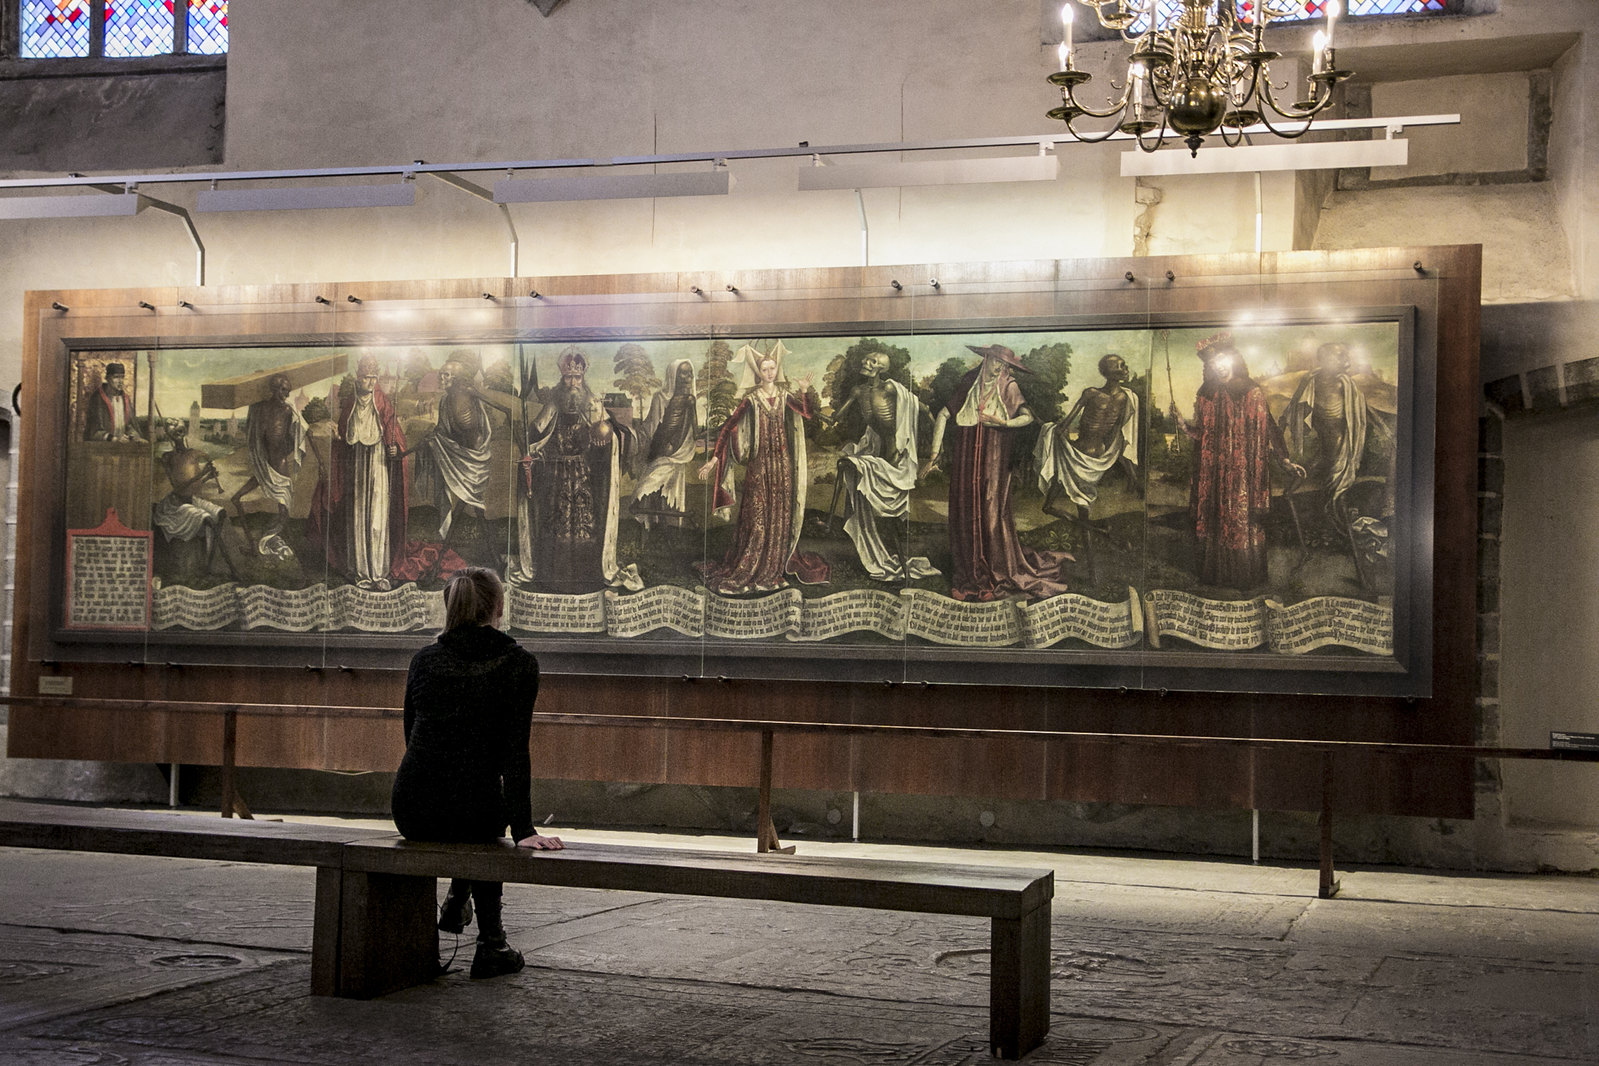 kuolemantanssi, danse macabre, niguliste kirik, nigulisten kirkkomuseo